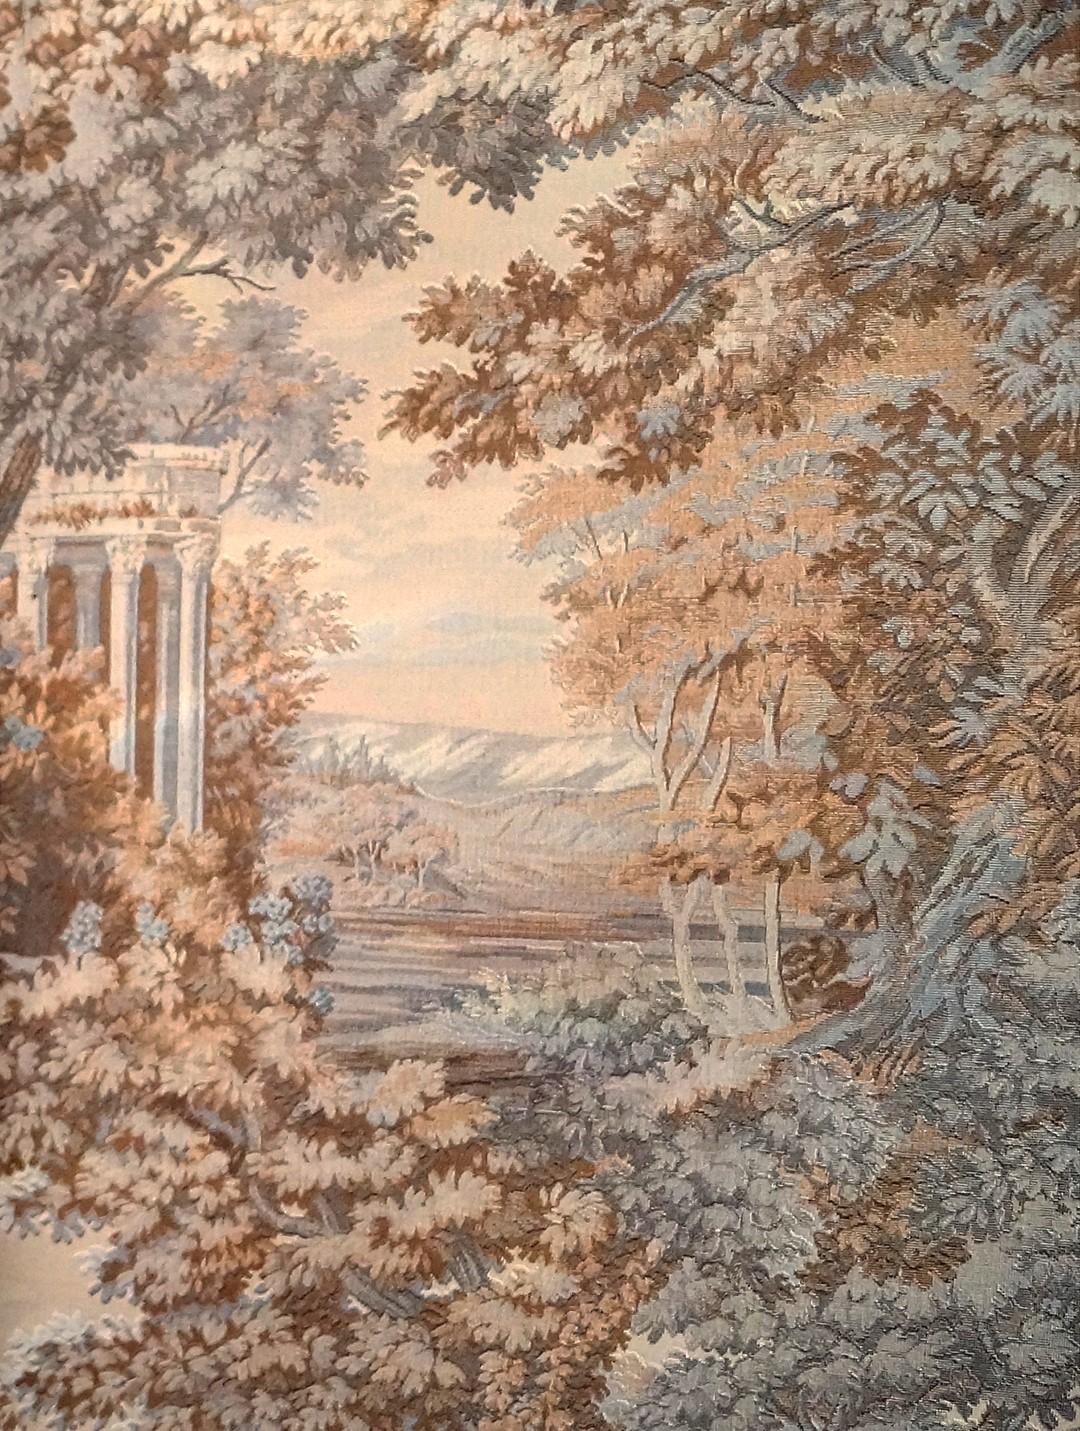 Фрагмент обоев на стене с имитацией английских гобеленов.